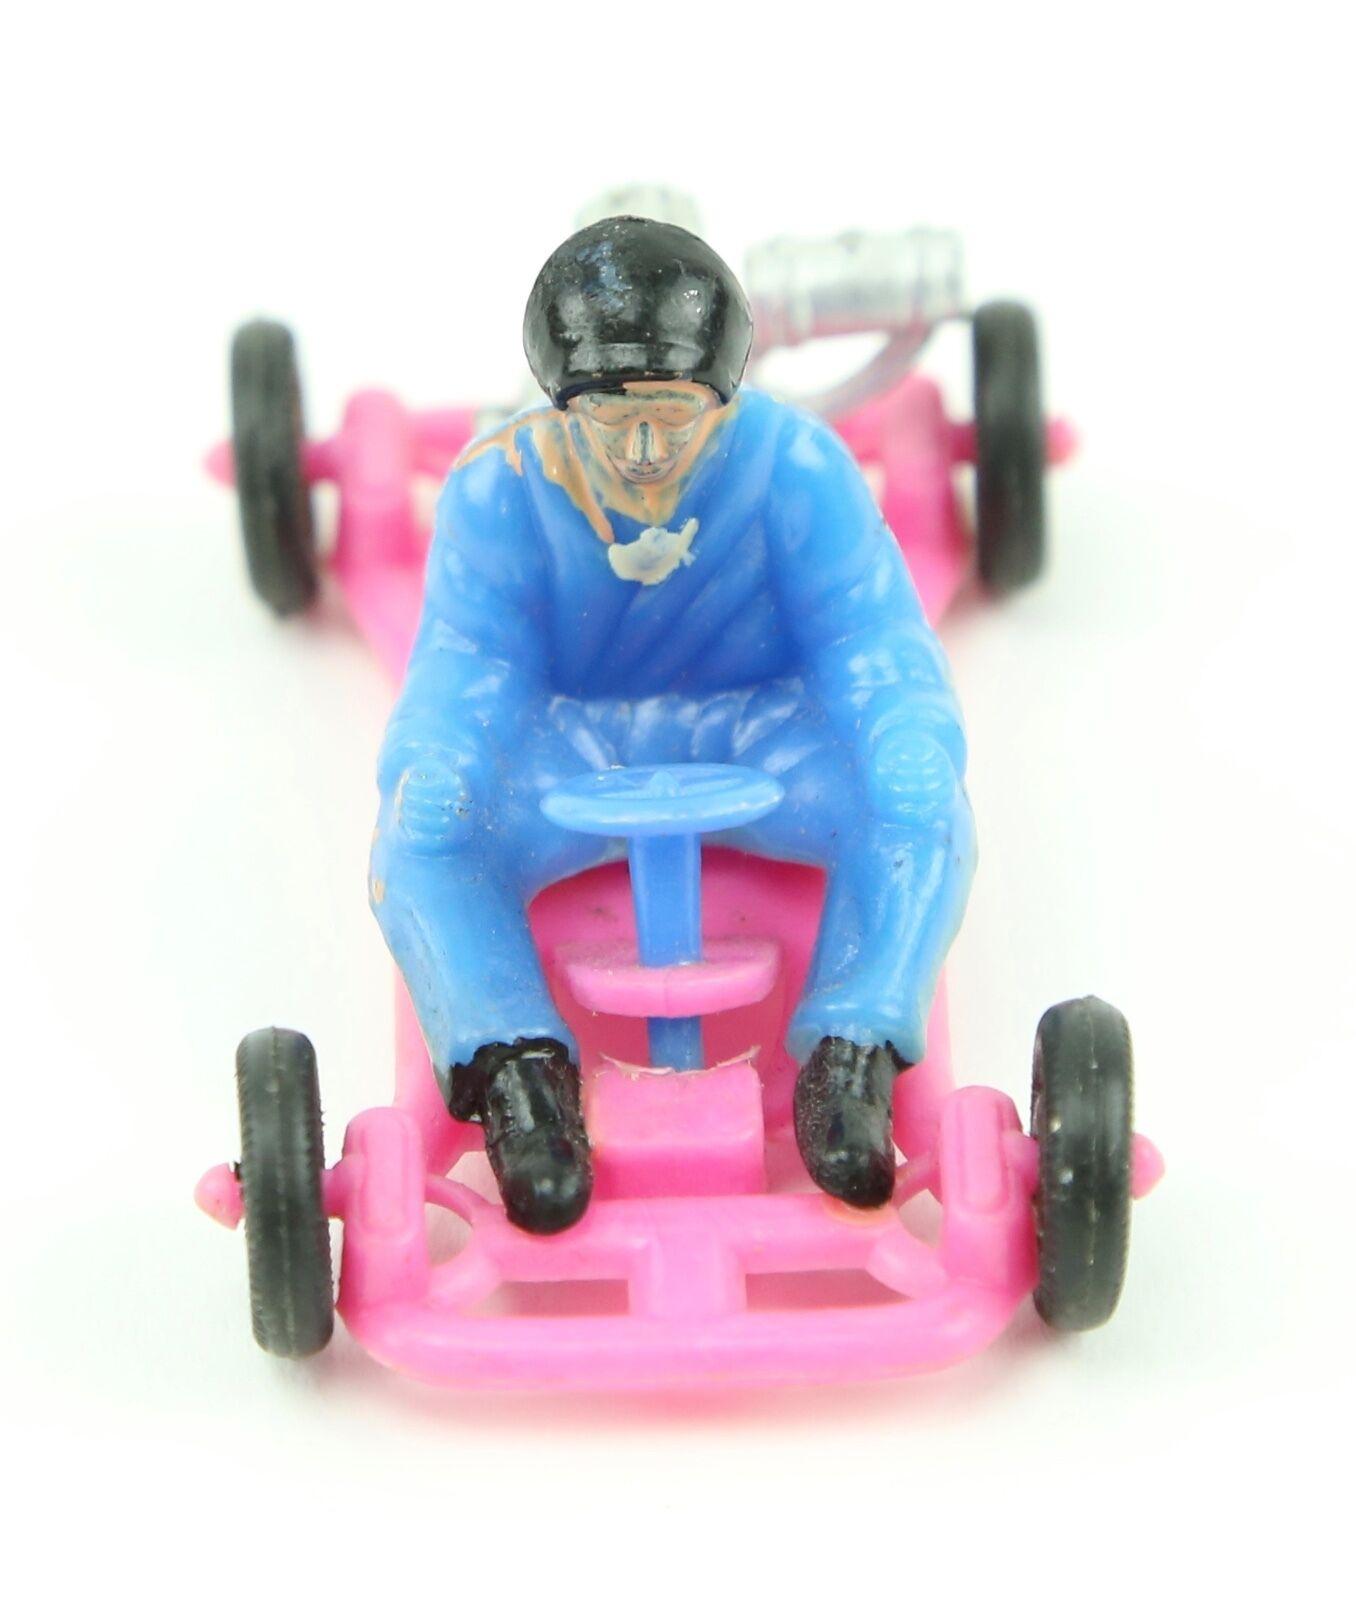 Vintage década de 1960 Go Kart Racing Plastic Toy Toy Toy Cake Topper máquina expendedora de premio rosado ad8332